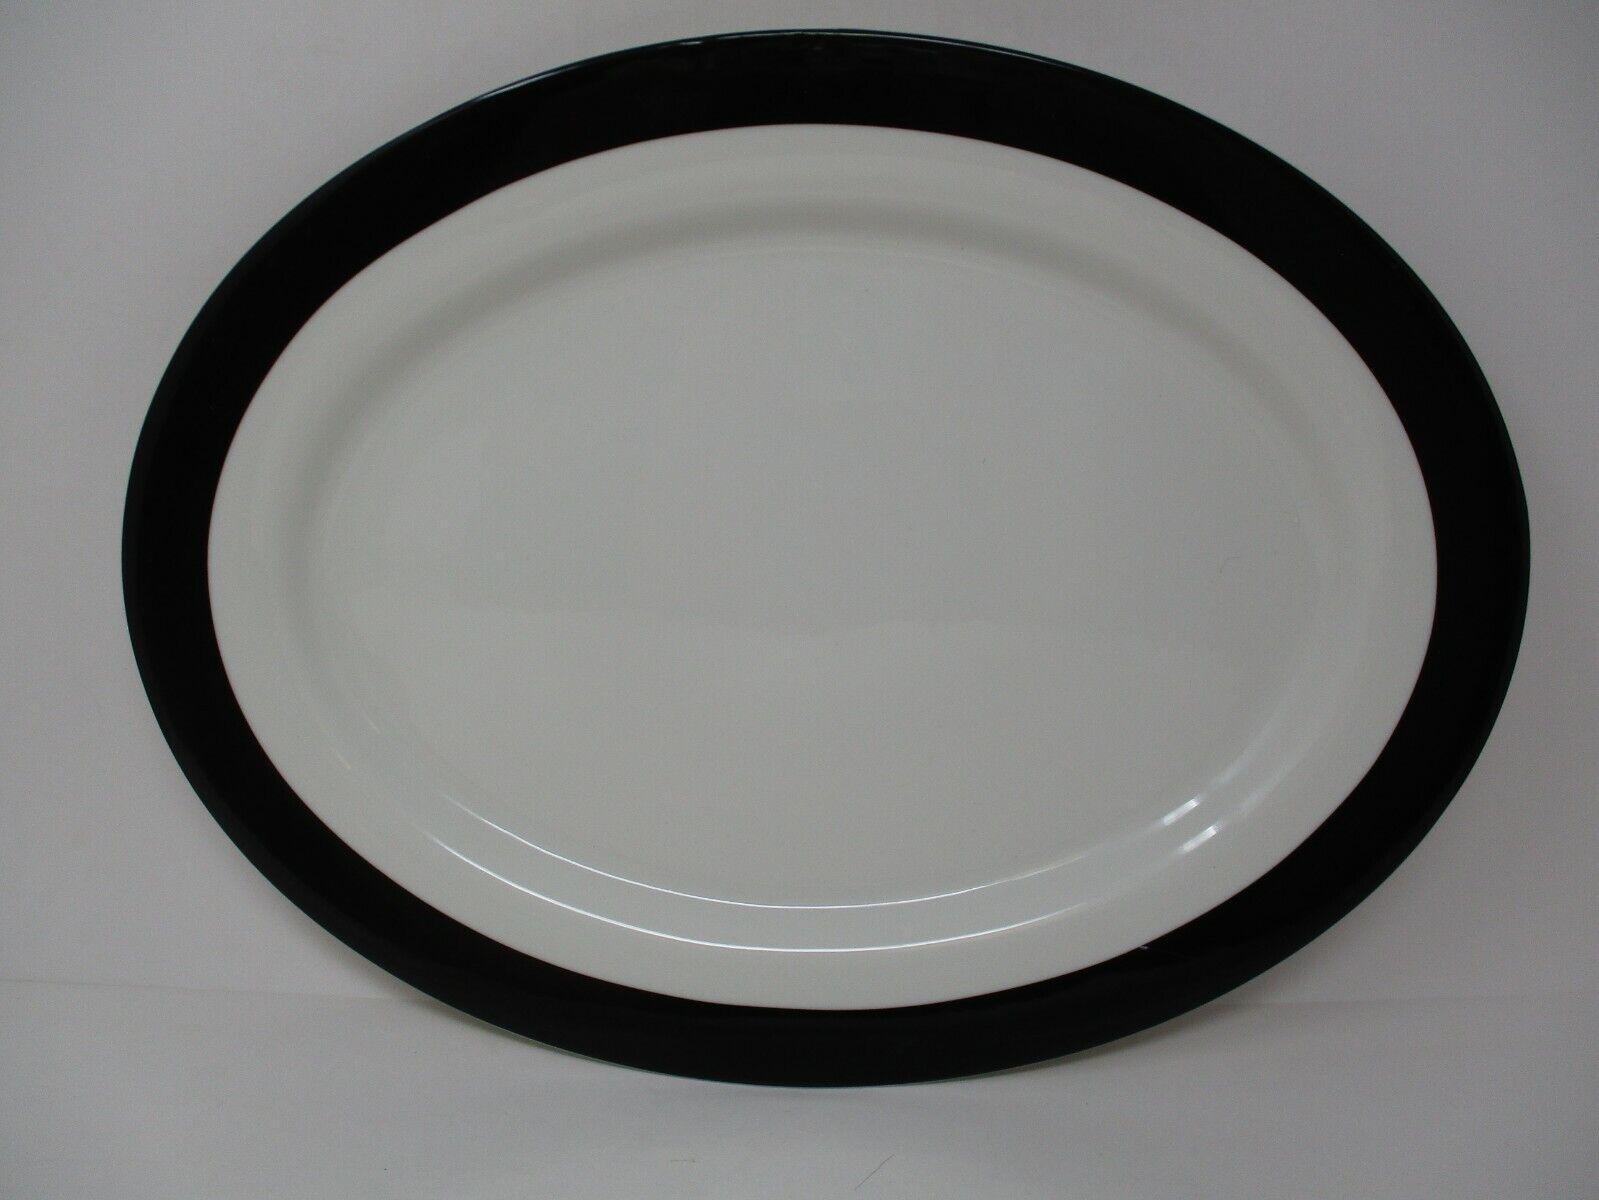 "Martha Stewart Collection 16.75"" Heirloom Oval White & Black Serving Platter"